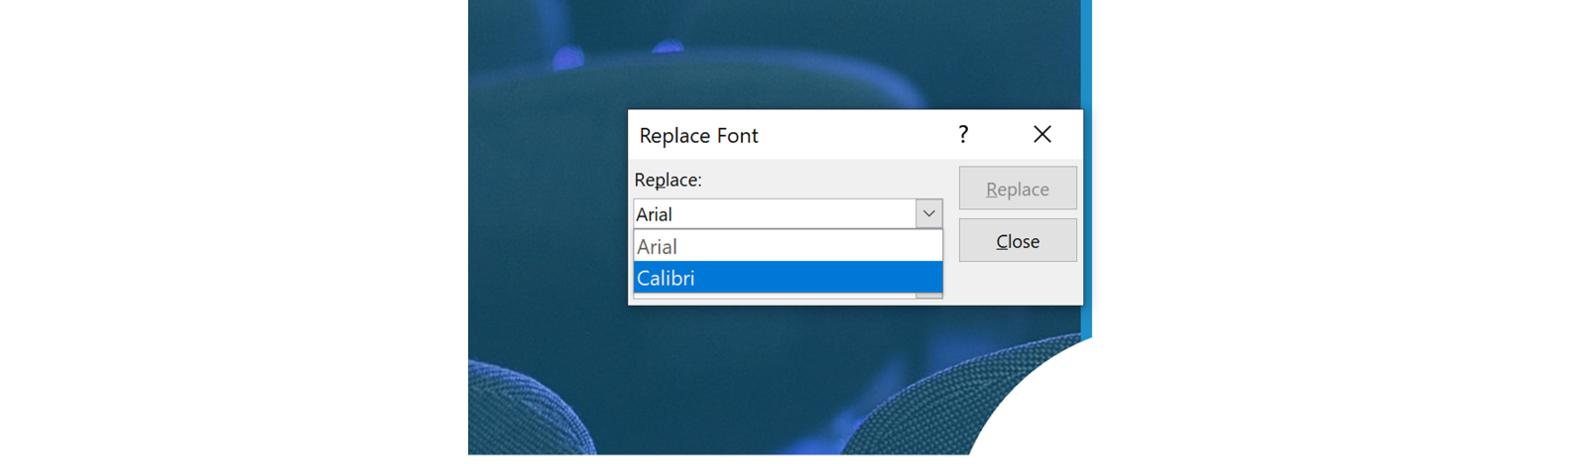 Replace fonts dropdown menu screenshot